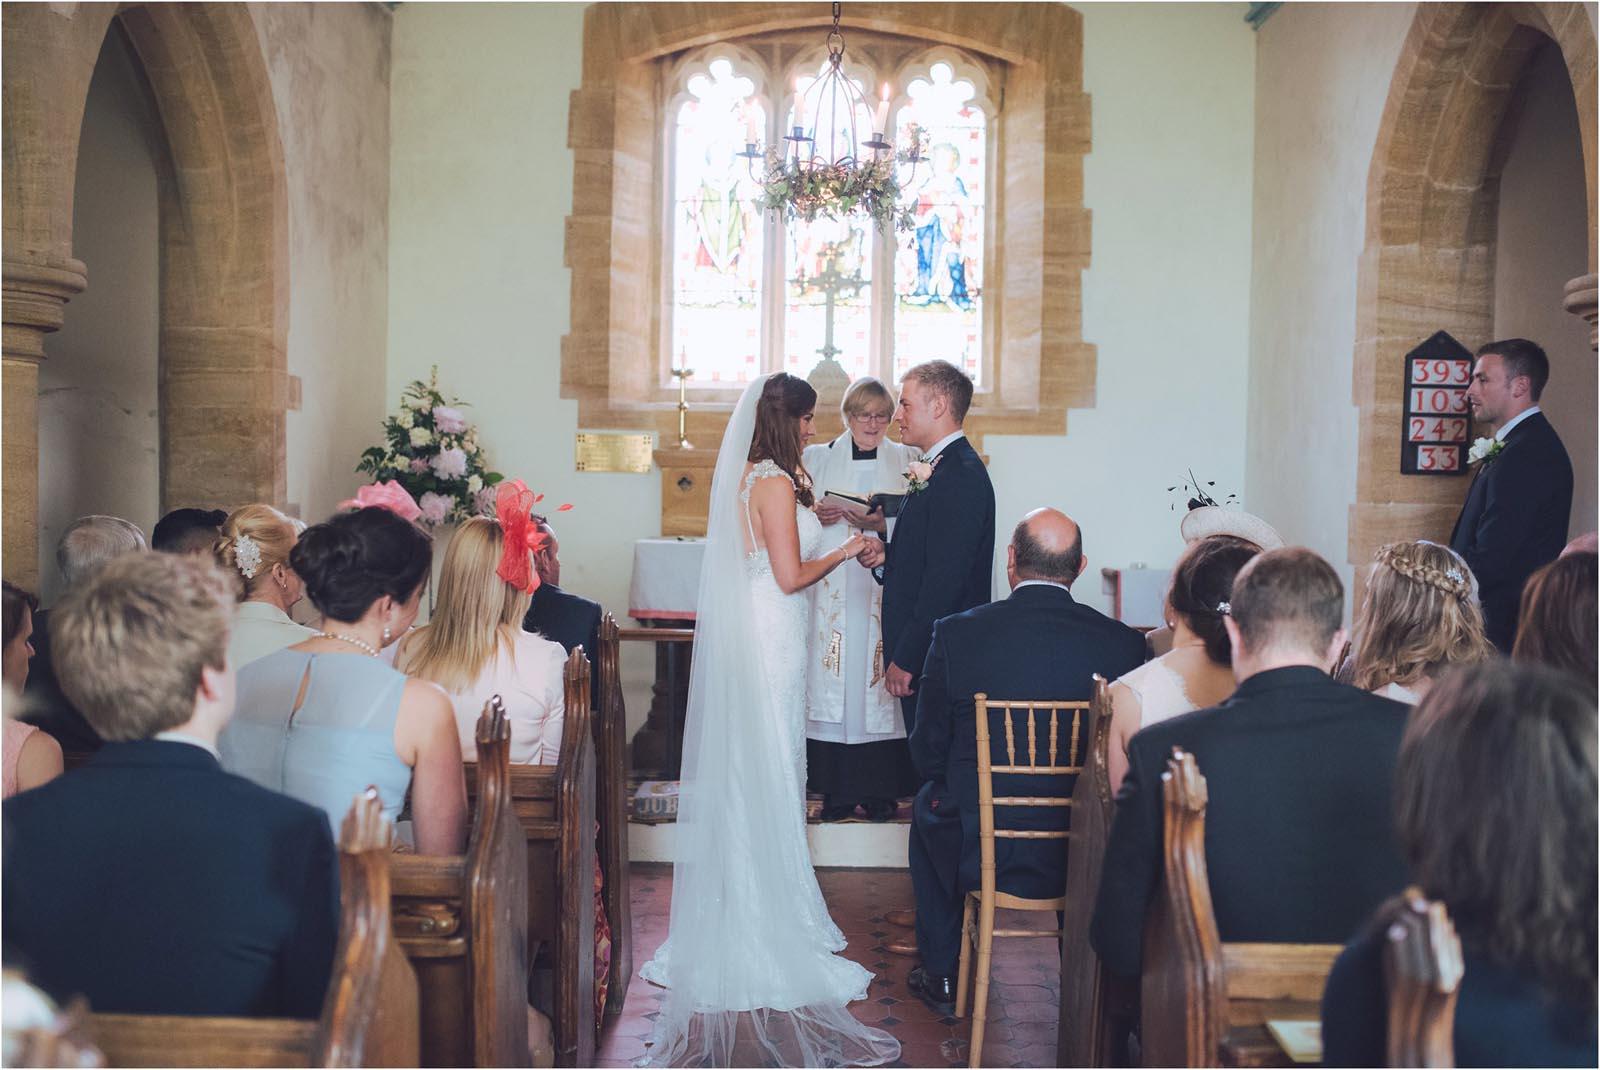 Simon biffen wedding photography 0063